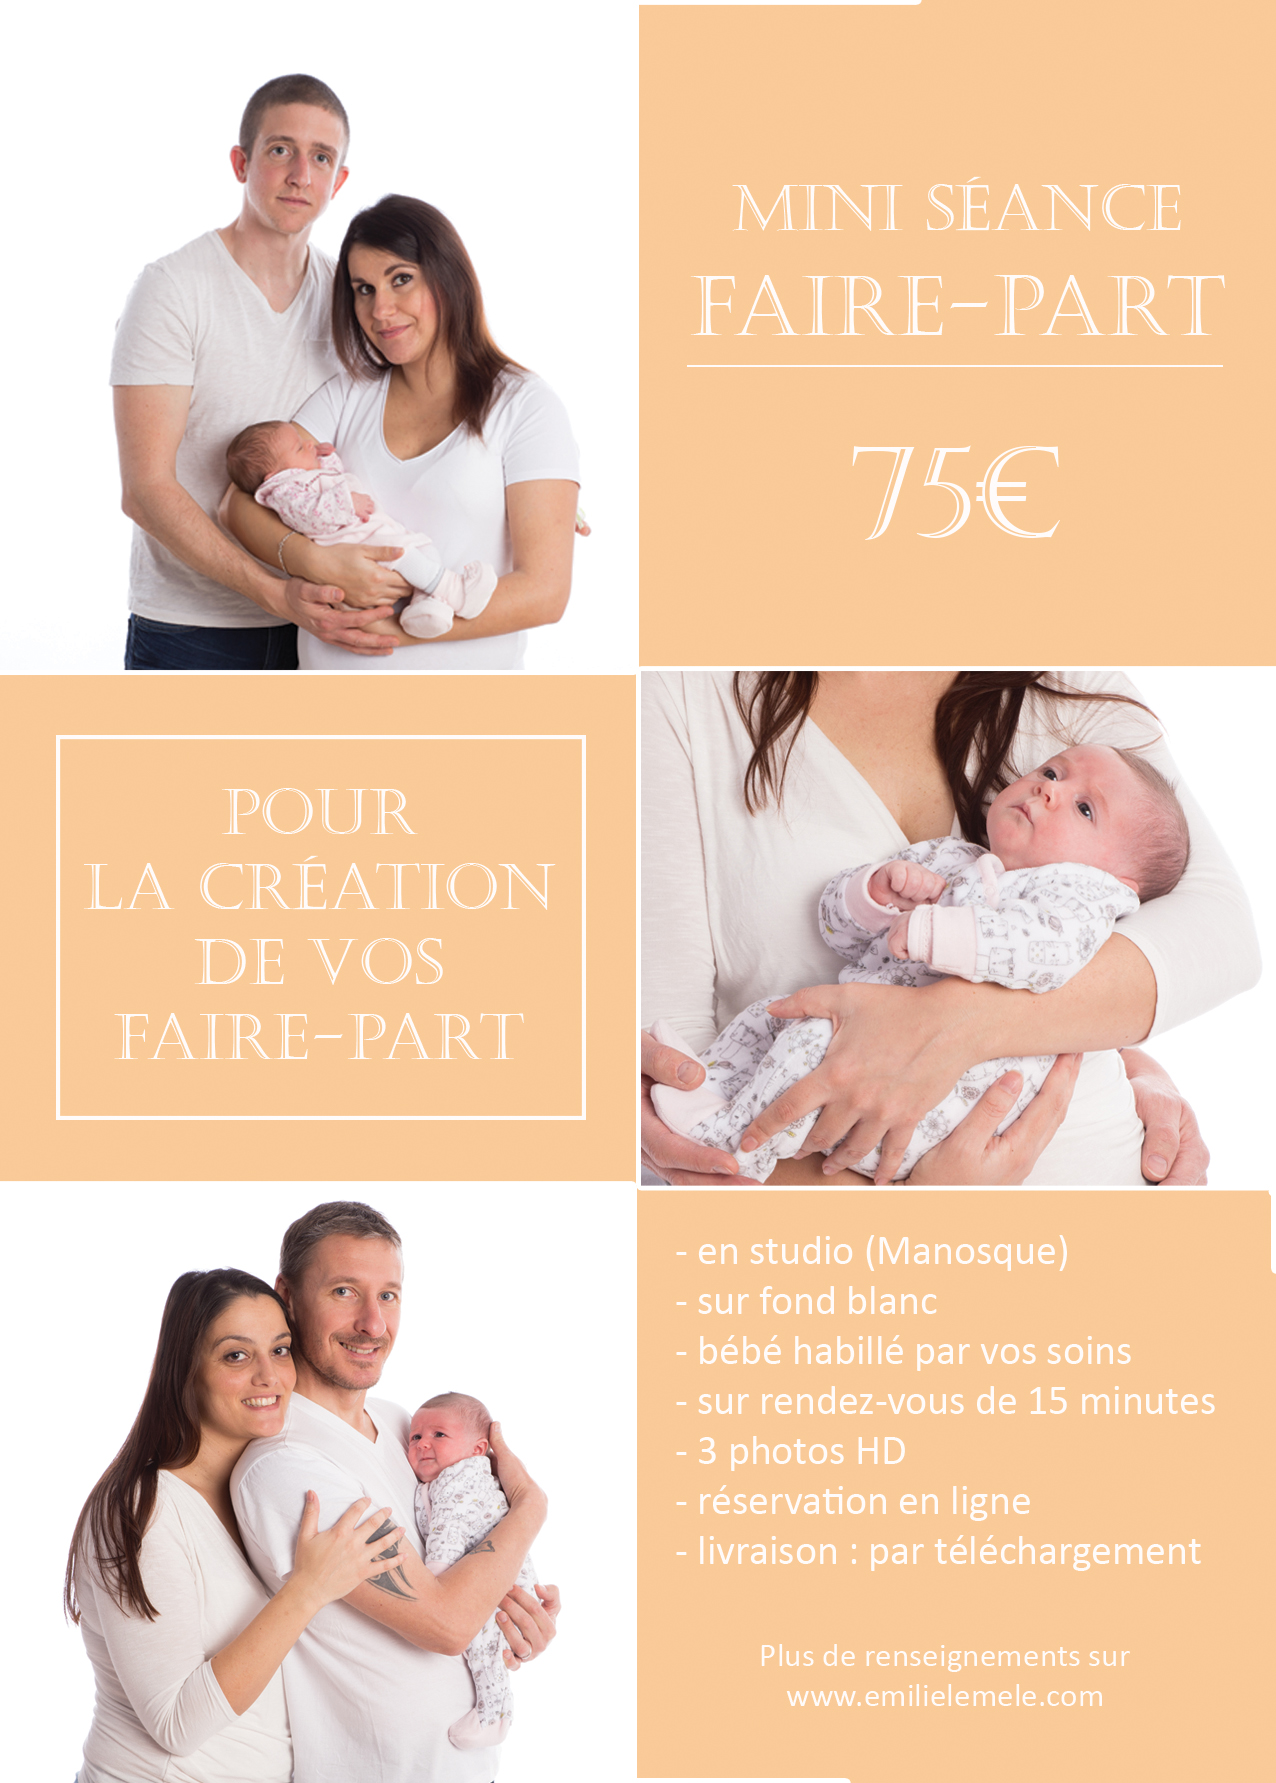 fairepart-naissance-manosque